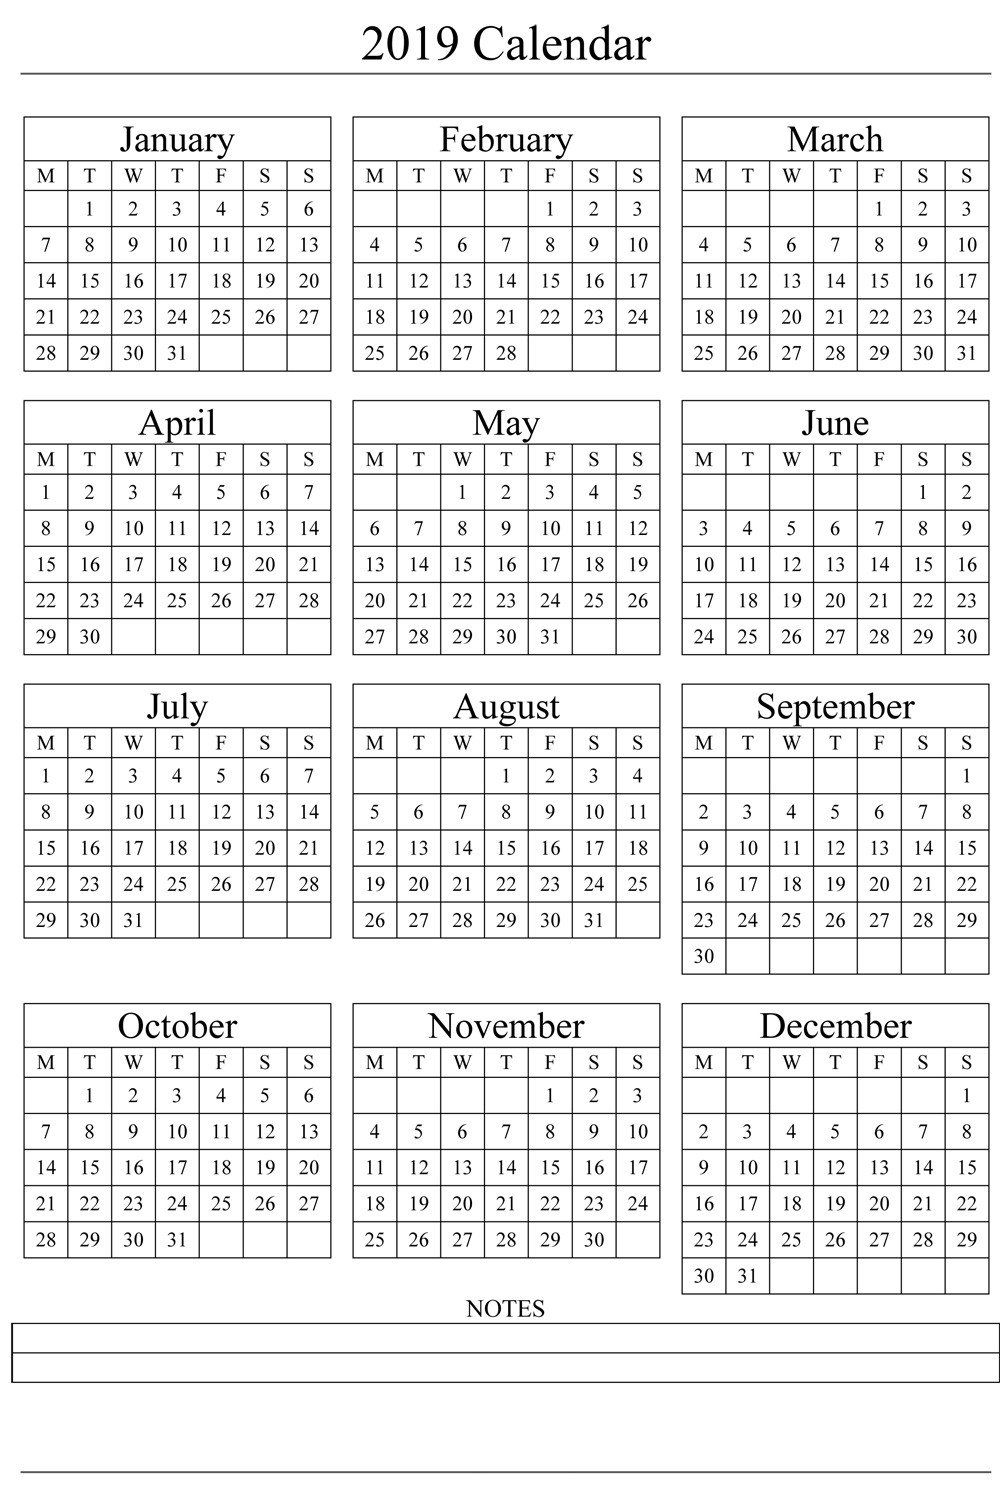 2019 Printable Calendar Templates – Blank Word Pdf – Calendar End Calendar 2019 Template Pdf